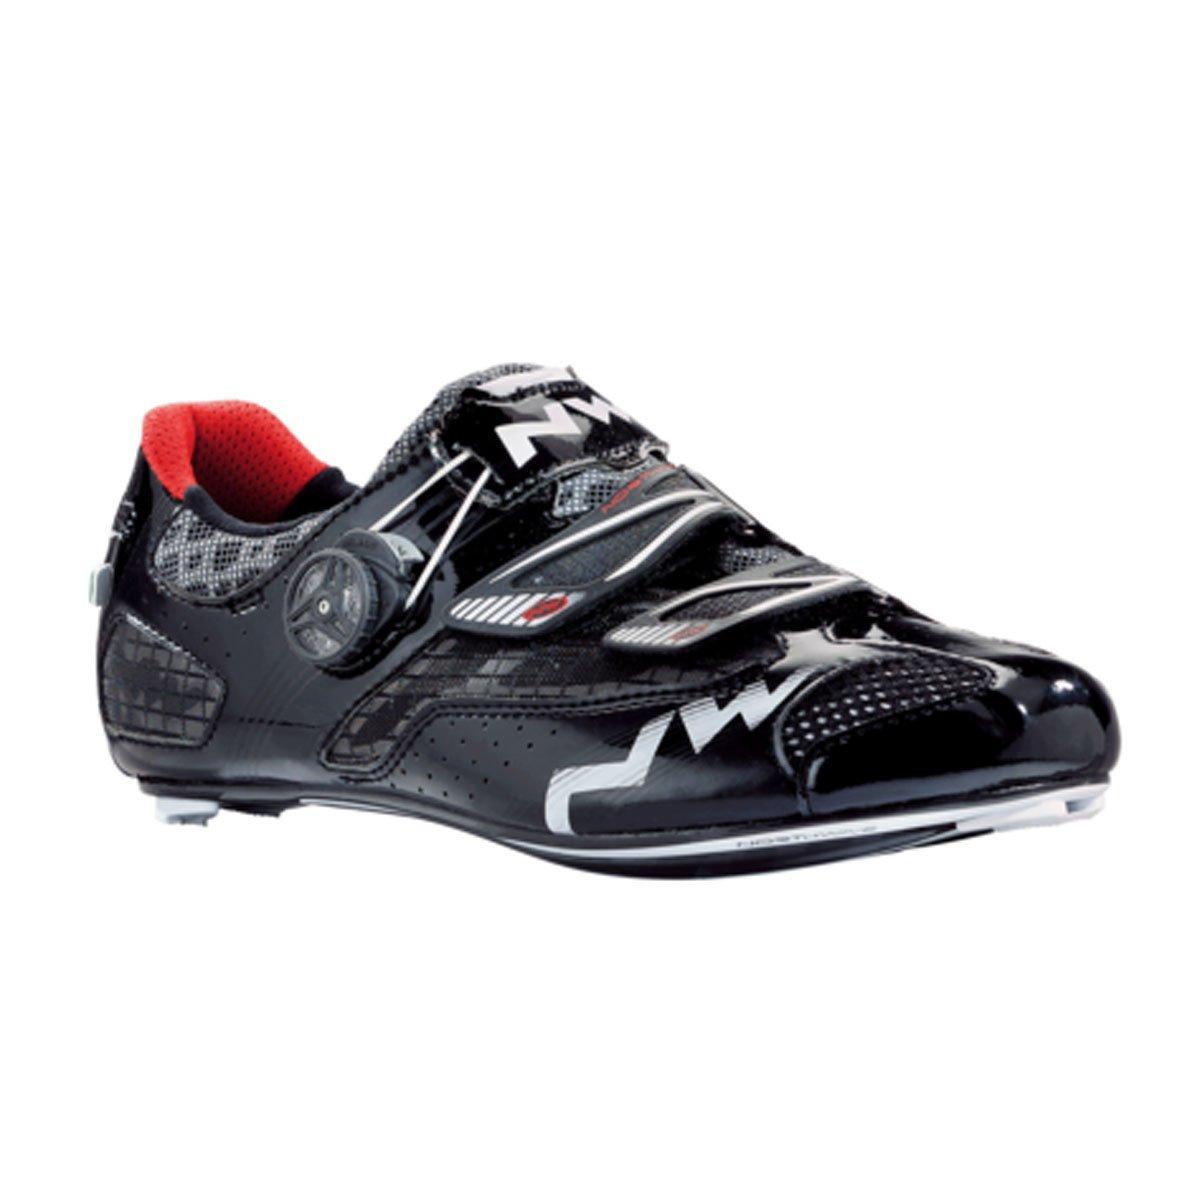 Northwave 2015 Men's Galaxy Road Cycling Shoes - 80141002-10 B00EGSM776 41 EU|Matte Black